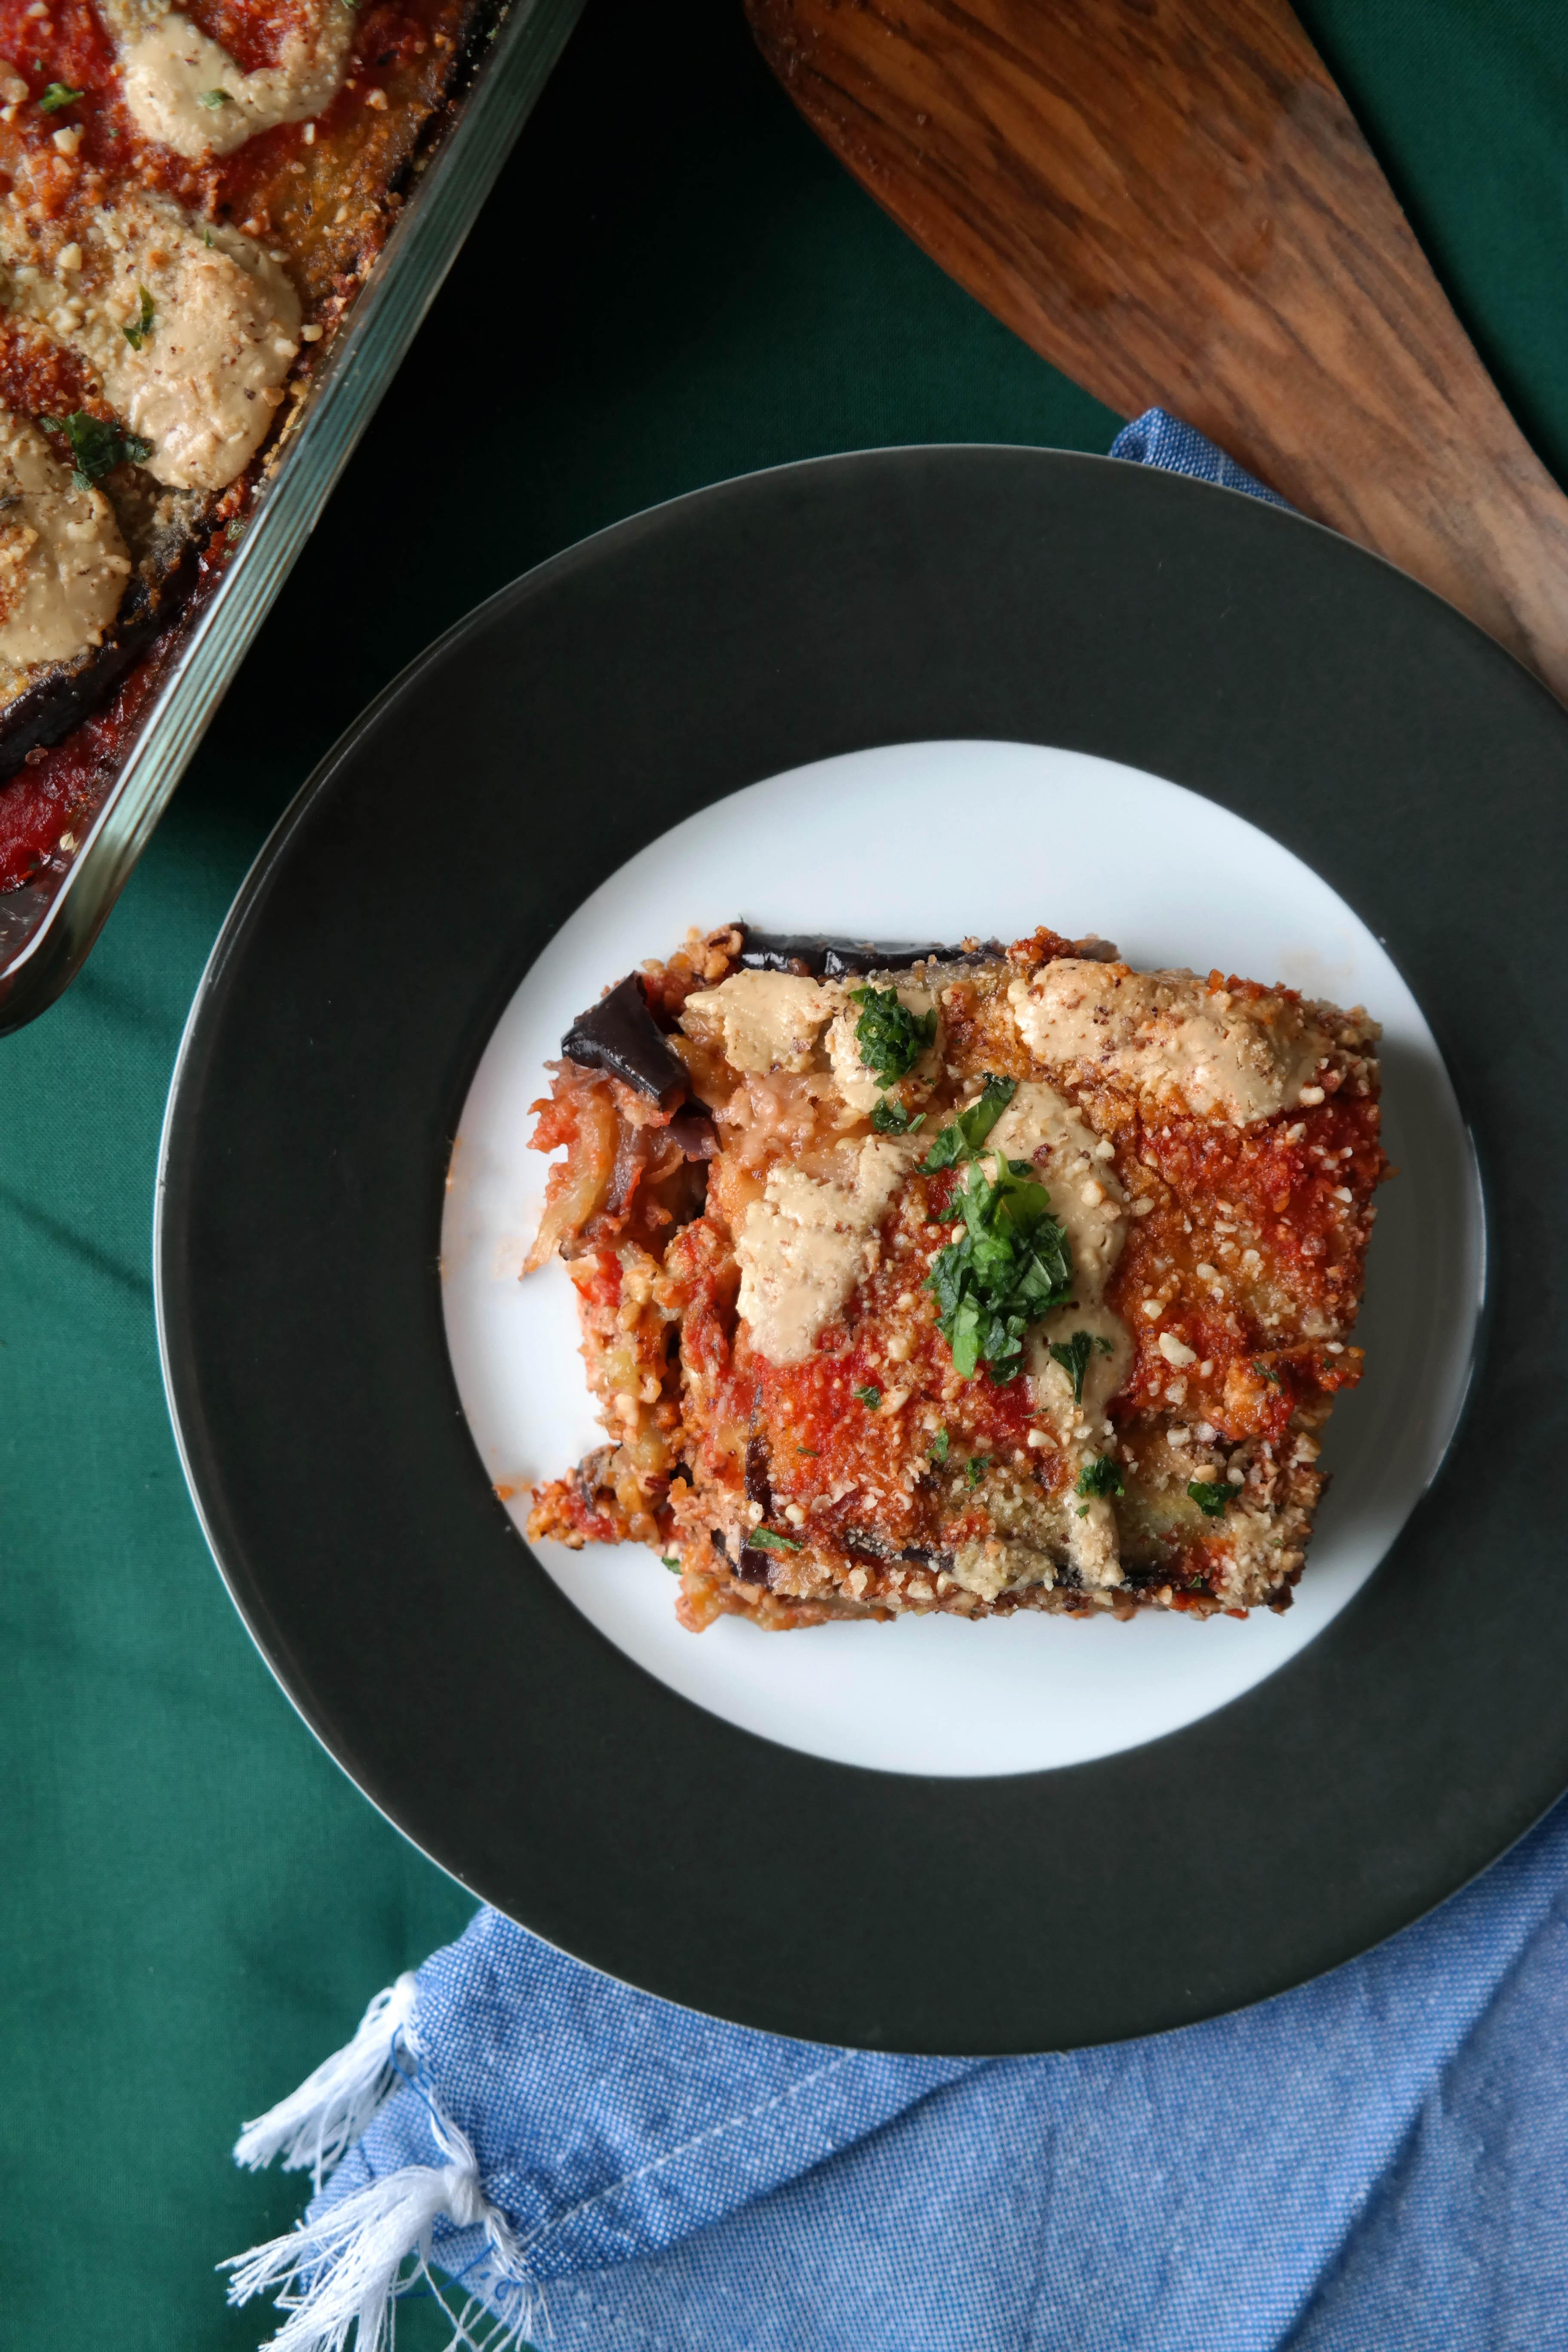 Vegane Parmigiana di Melanzane Rezept Auberginen-Auflauf